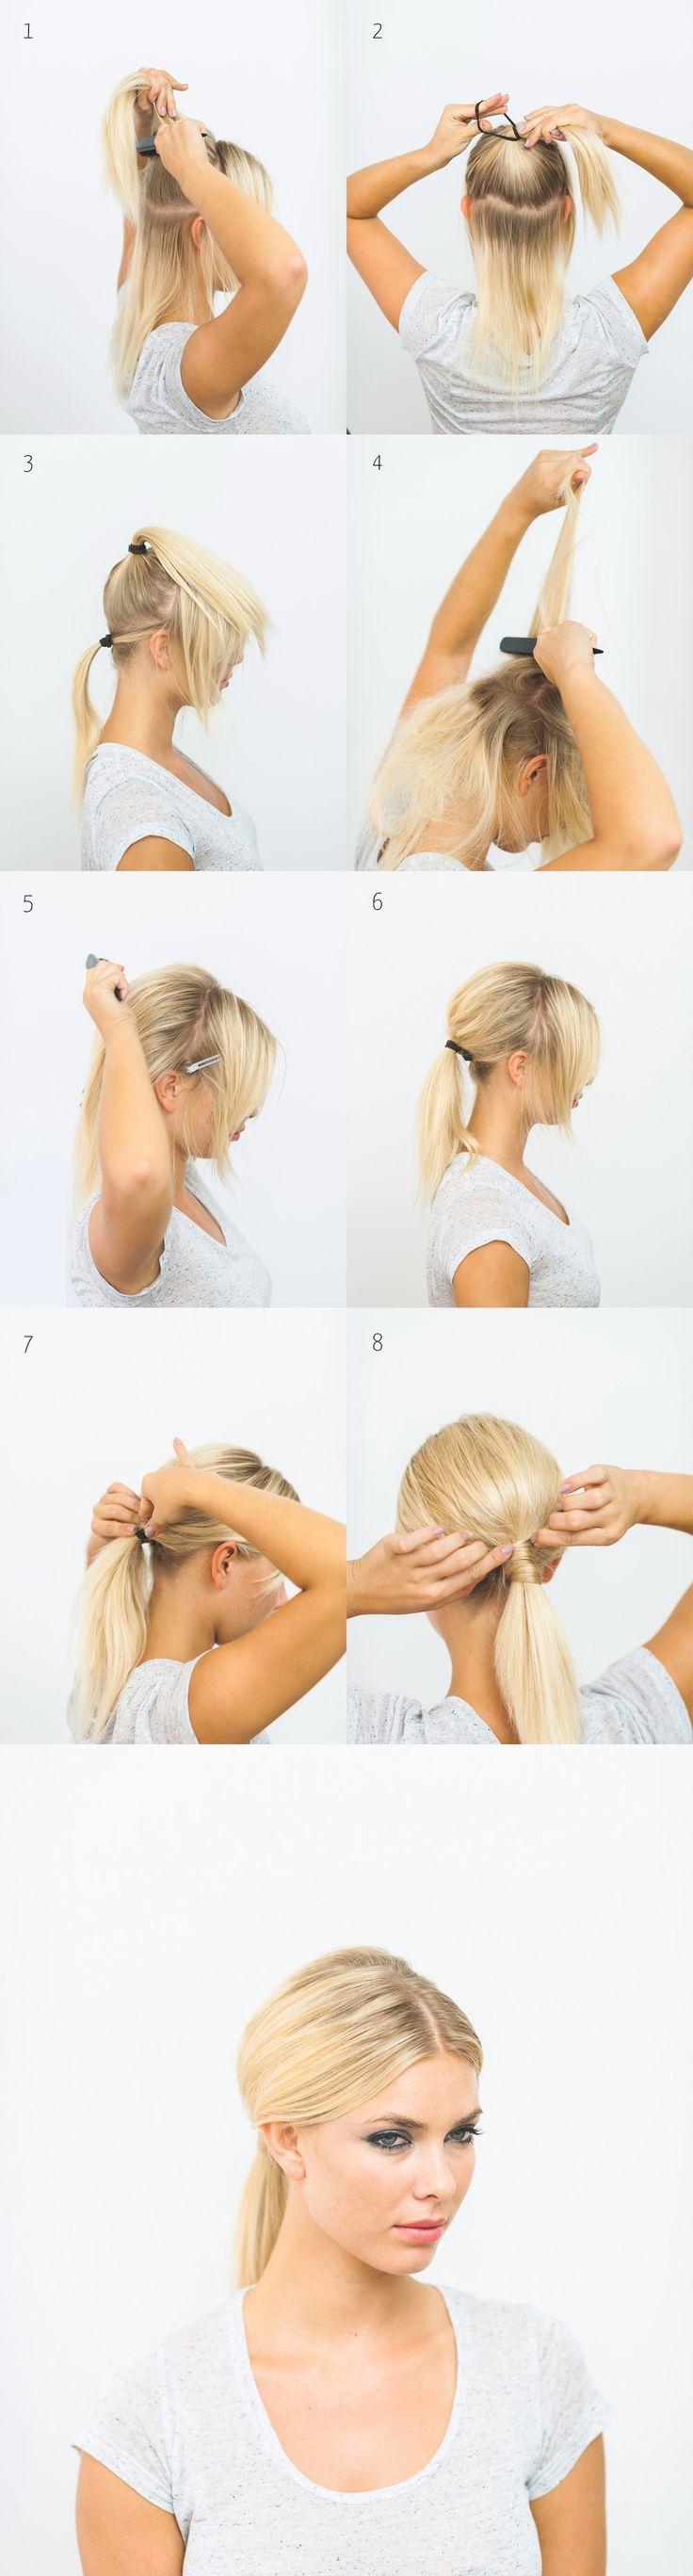 230 best DIY HAIR STYLES images on Pinterest